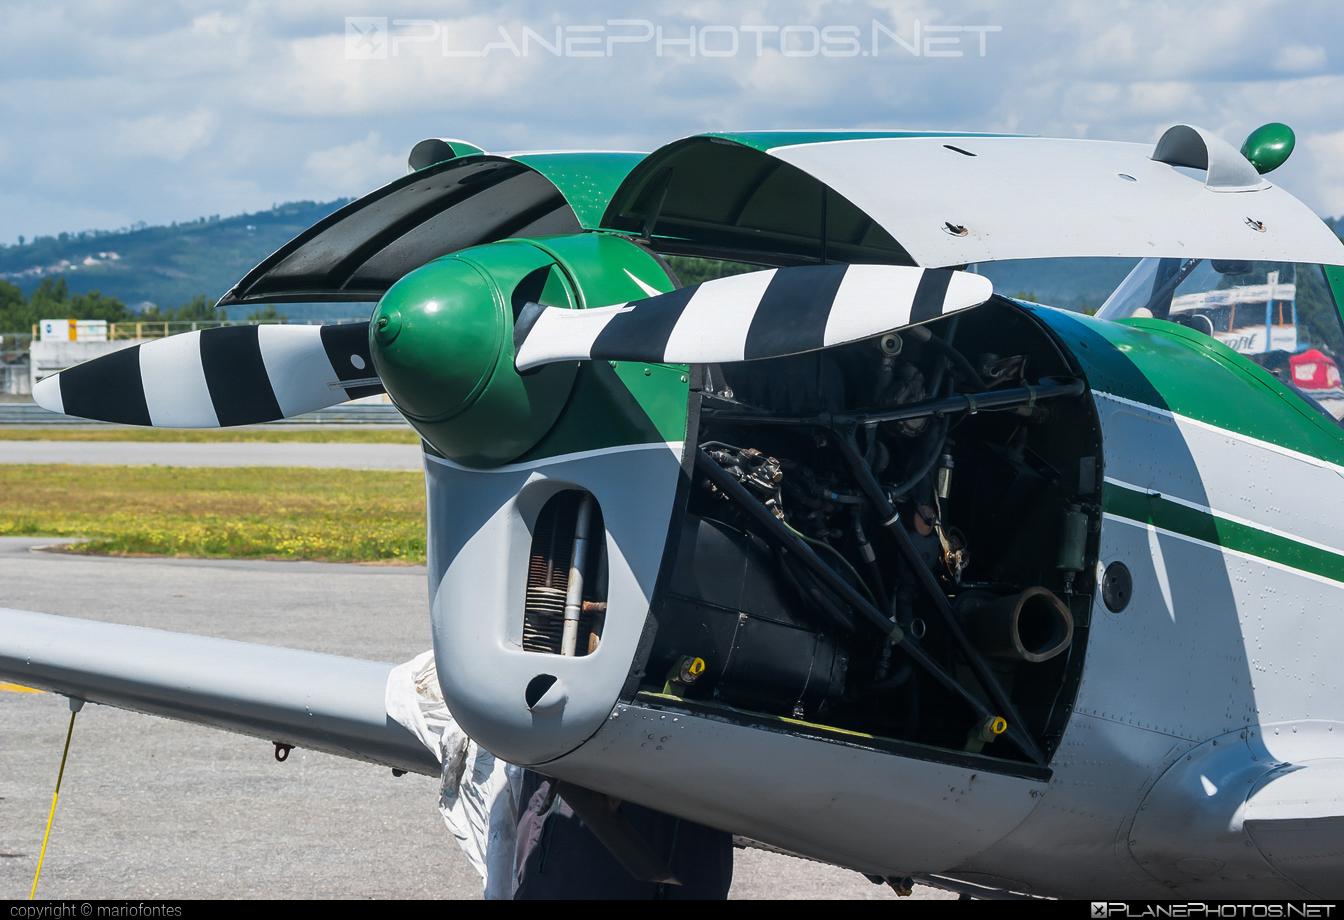 OGMA DHC-1 Chipmunk Mk.20 - CS-AZX operated by Private operator #chipmunkmk20 #dhc1 #dhc1chipmunk #dhc1chipmunkmk20 #oficinasgeraisdematerialaeronautico #ogma #ogmachipmunk